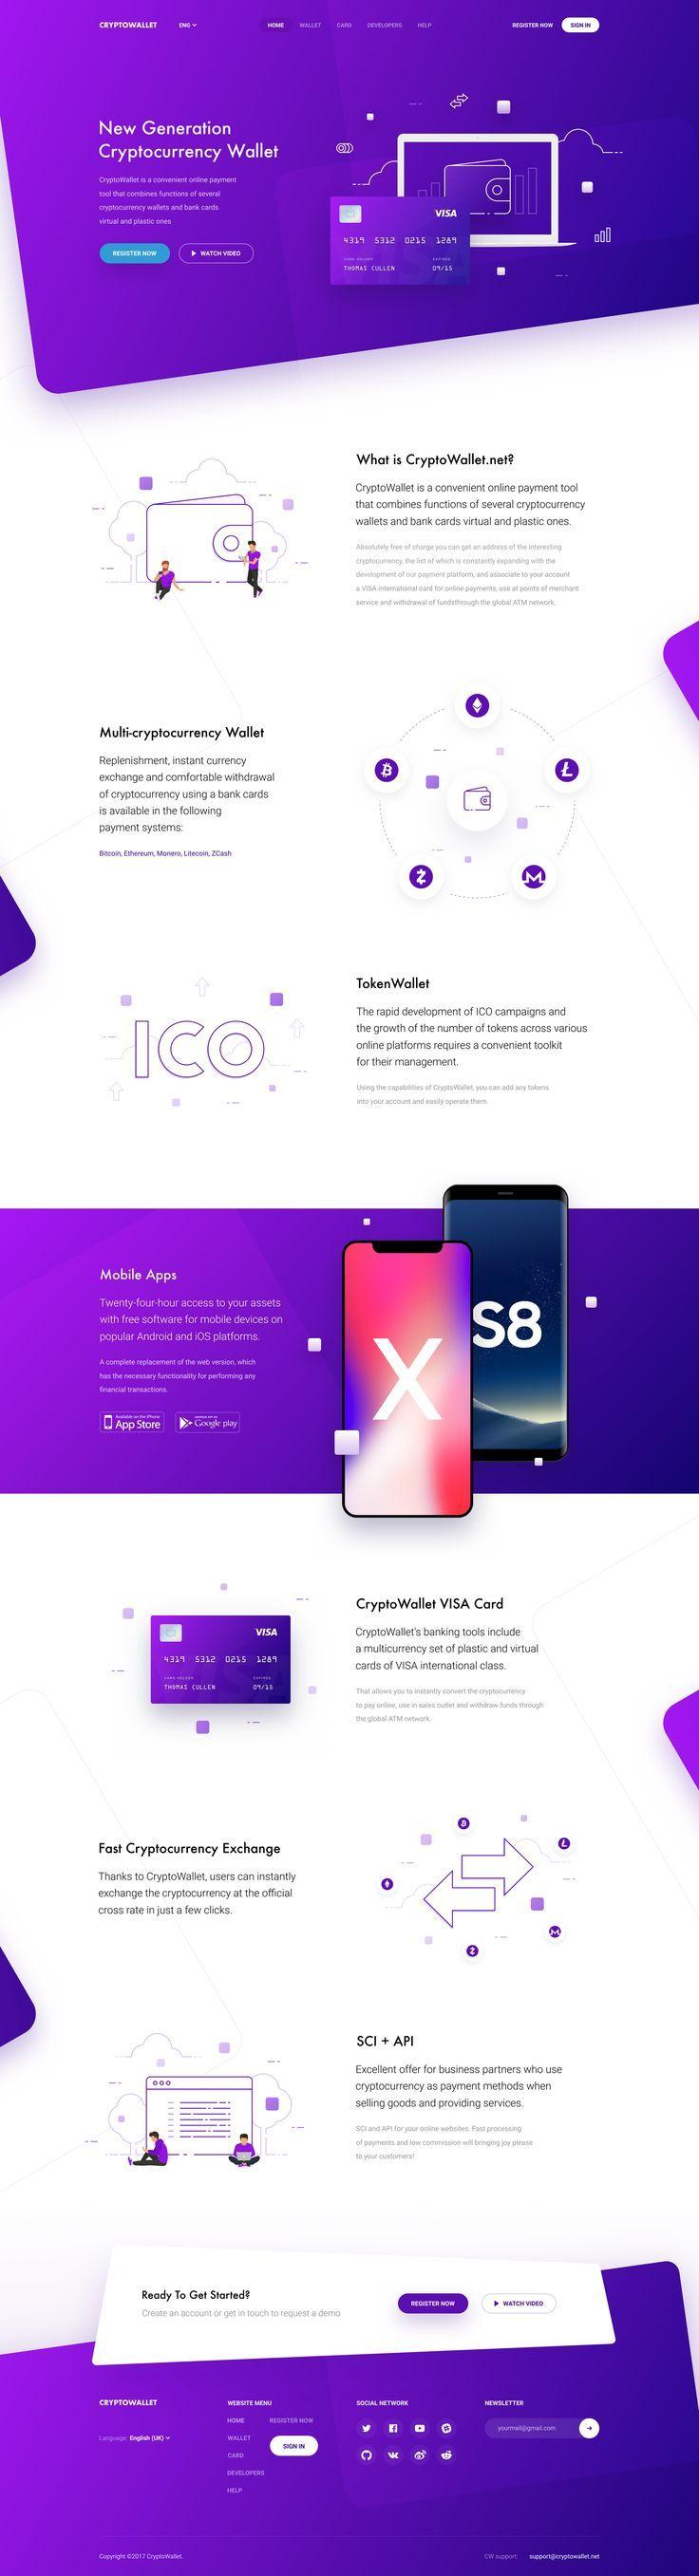 Web Design Inspiration 2018 Web Design Inspiration 2018 Website Design Templates Fun Creativ Web Design Web Development Design Website Design Inspiration